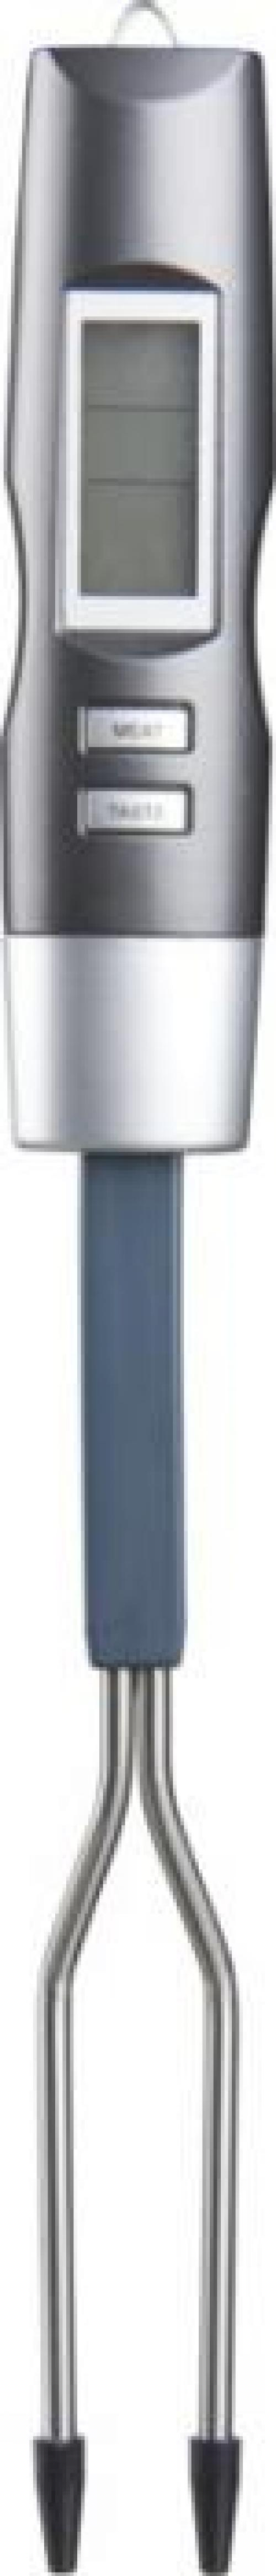 Horquilla con termómetro digital Wells